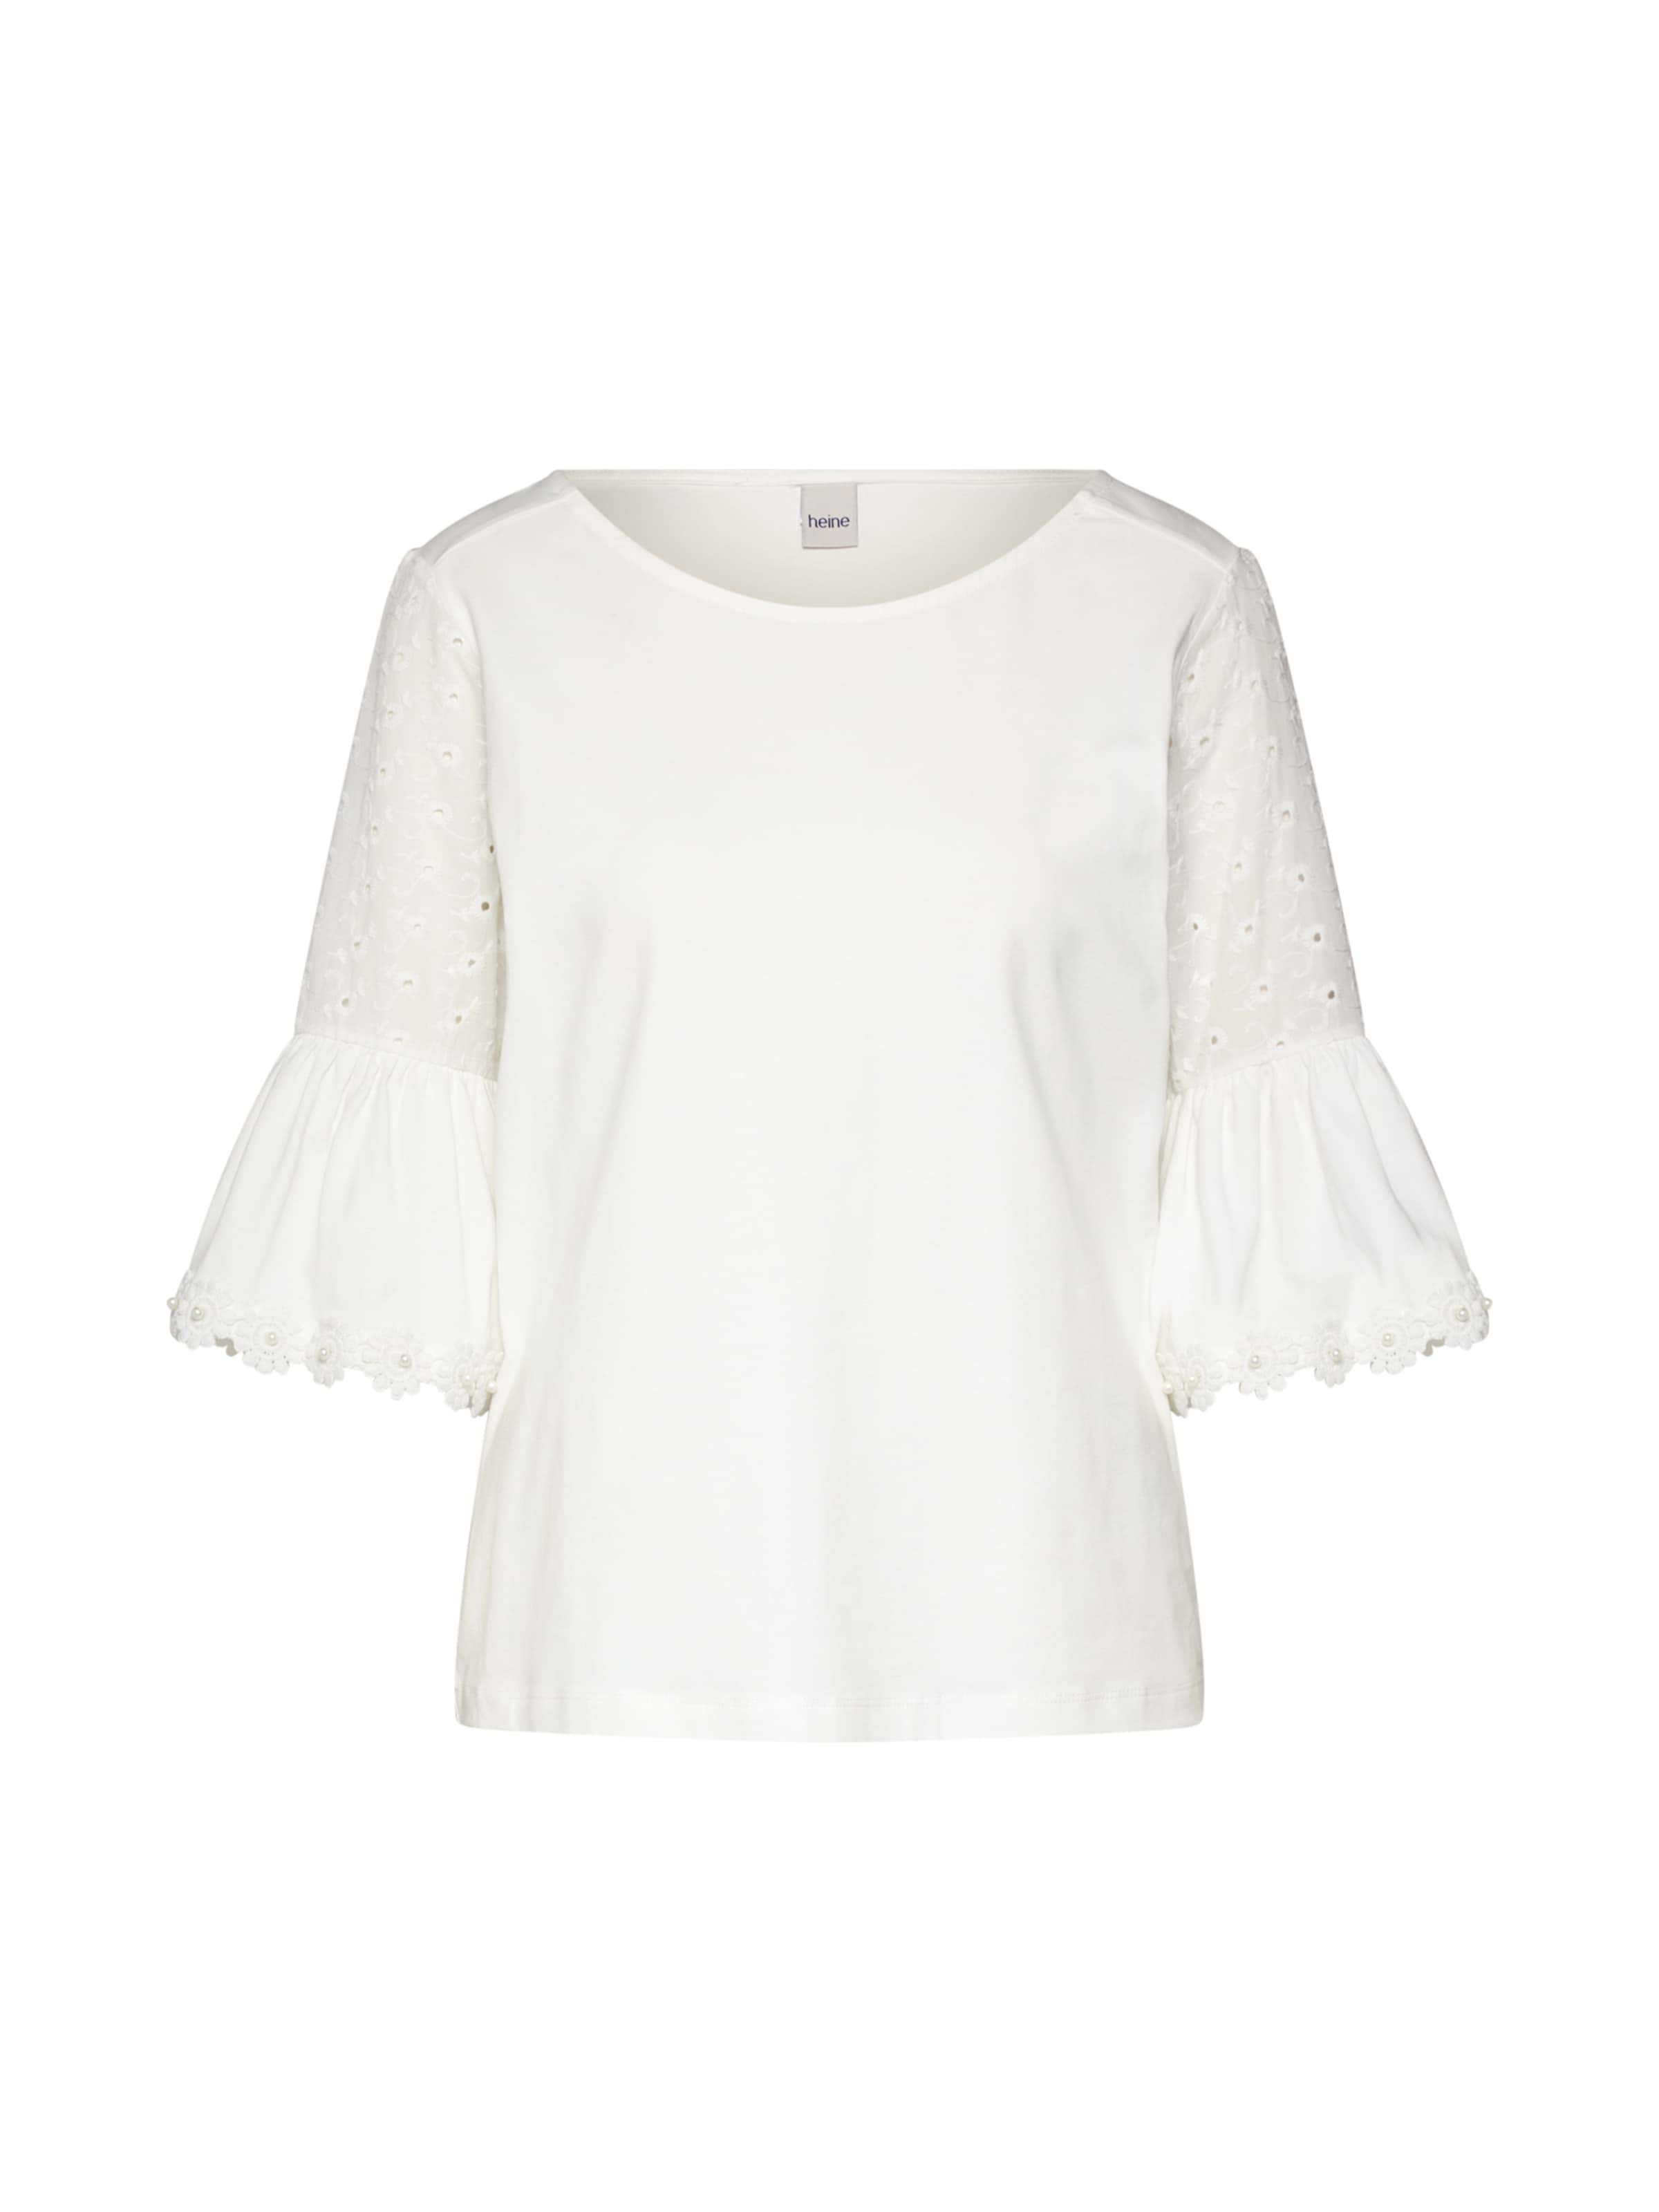 Heine Offwhite Shirt In In Heine In Heine Shirt Shirt Offwhite eWEdQrCxBo